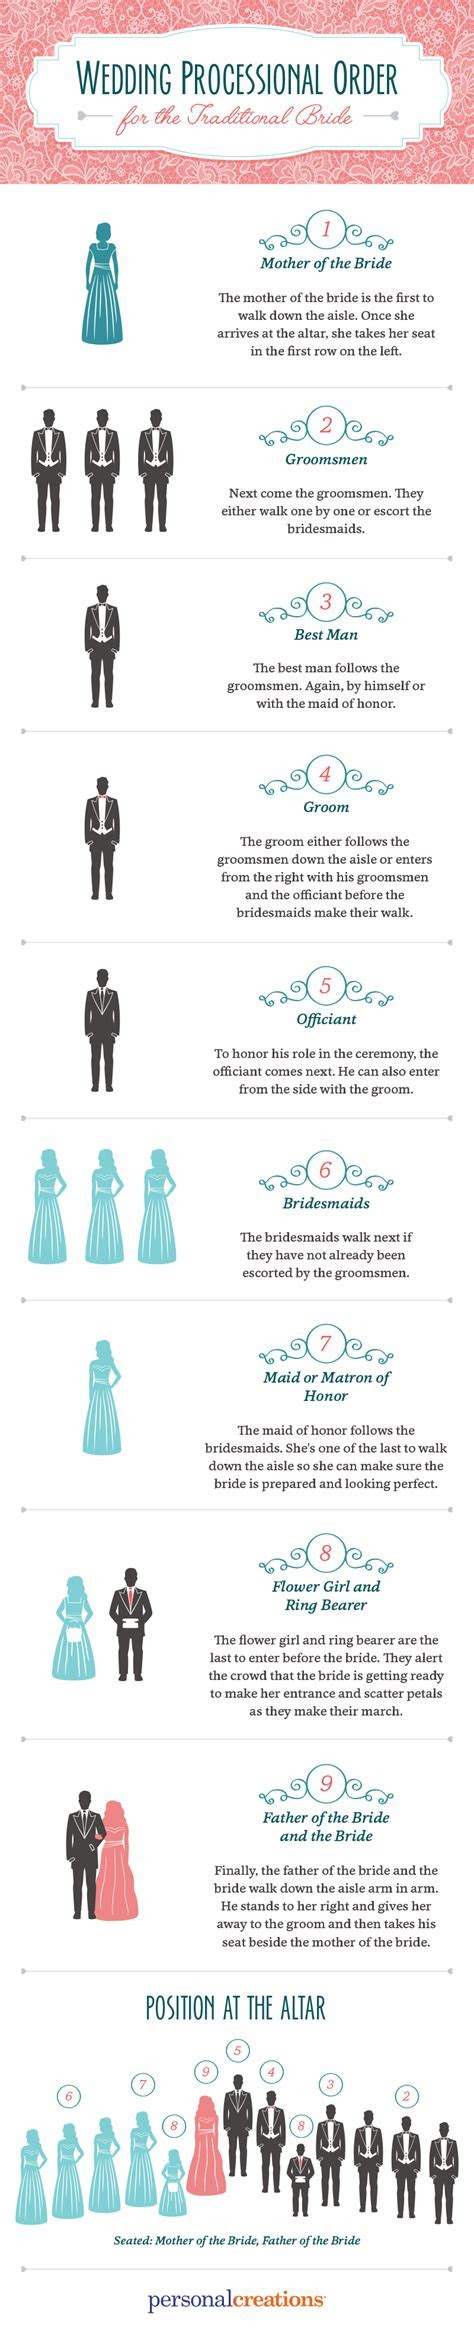 Ceremony: Great Wedding Ceremony Processional Idea